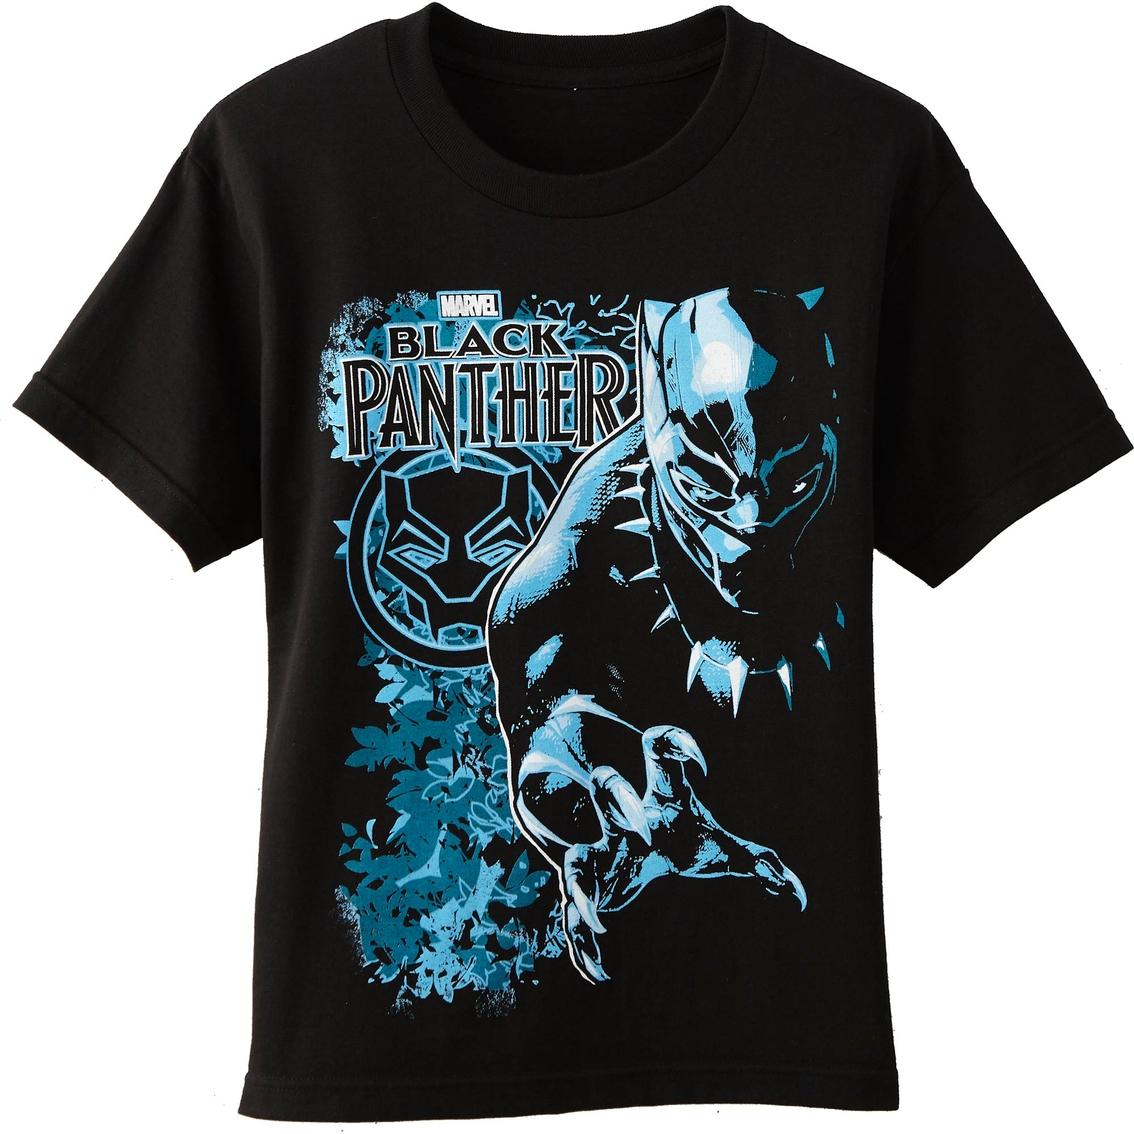 b19b67be Marvel Boys Black Panther Tee | Boys 8-20 | Apparel | Shop The Exchange